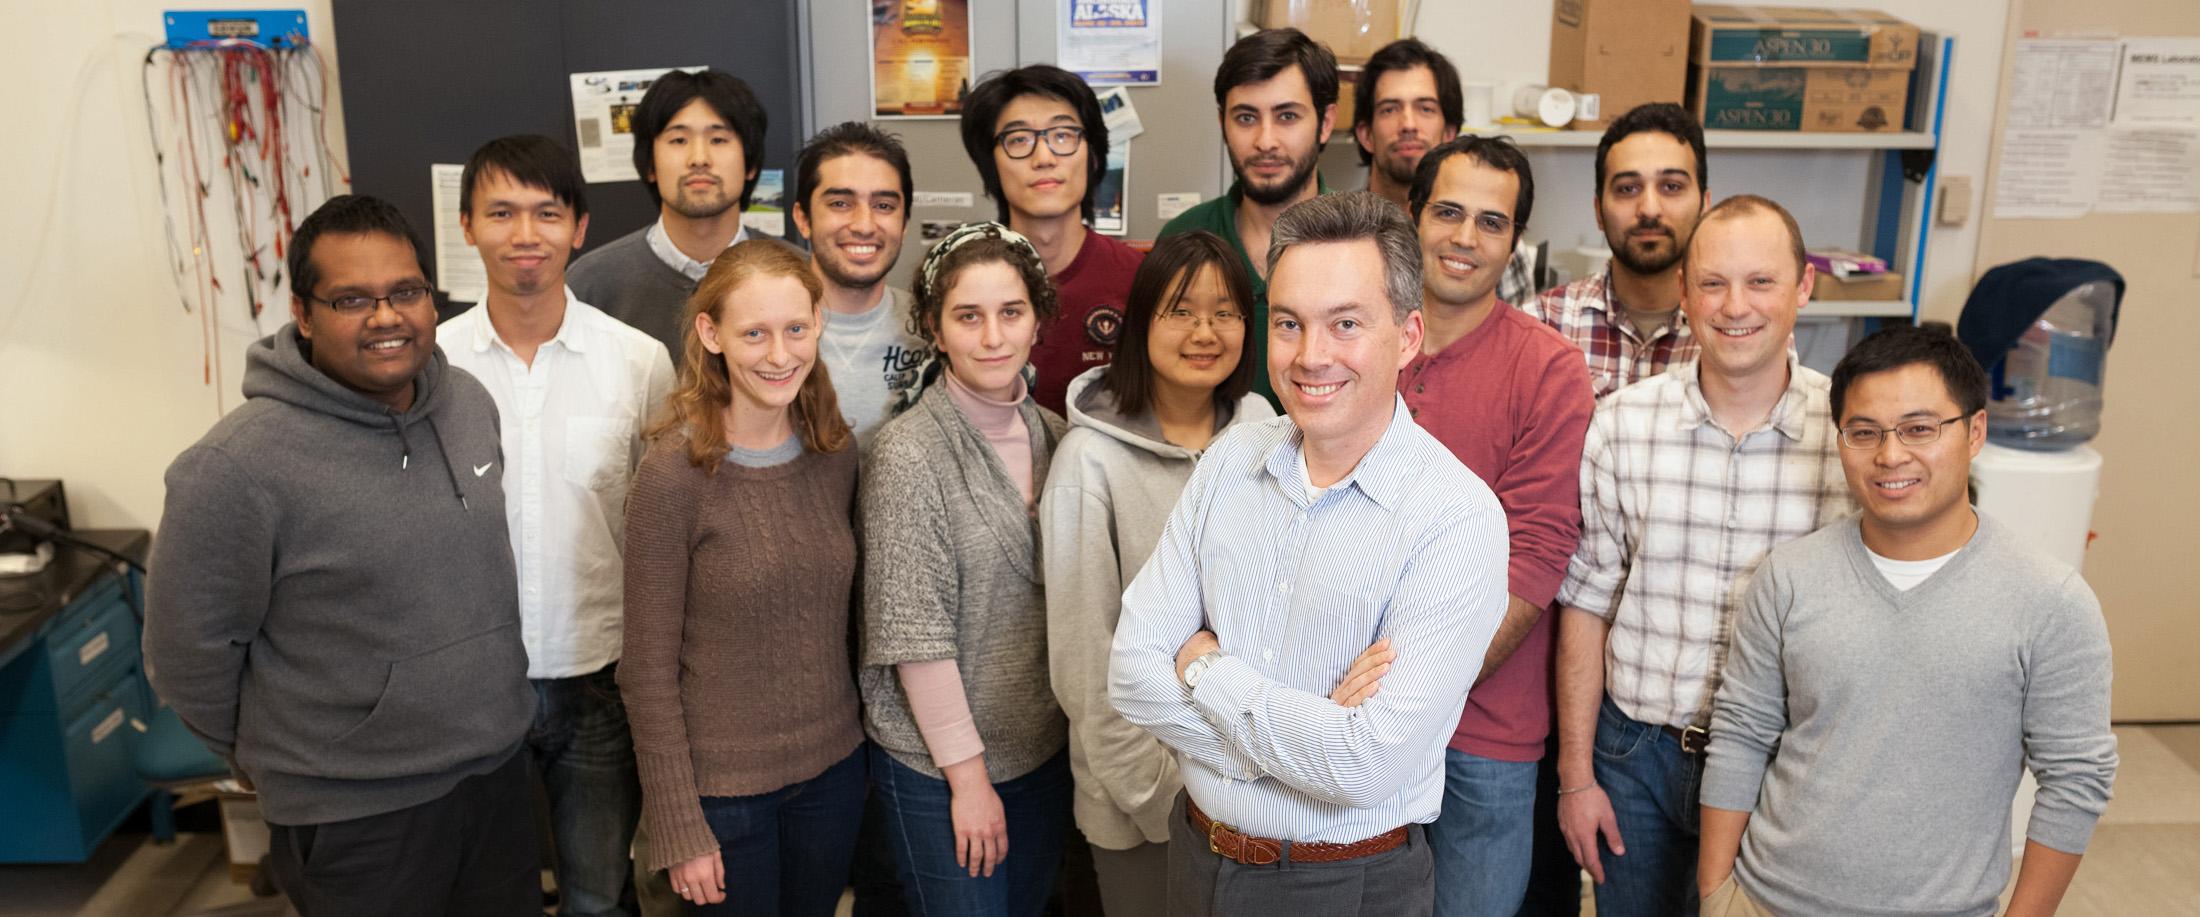 UC Davis MEMS Lab Group Photo